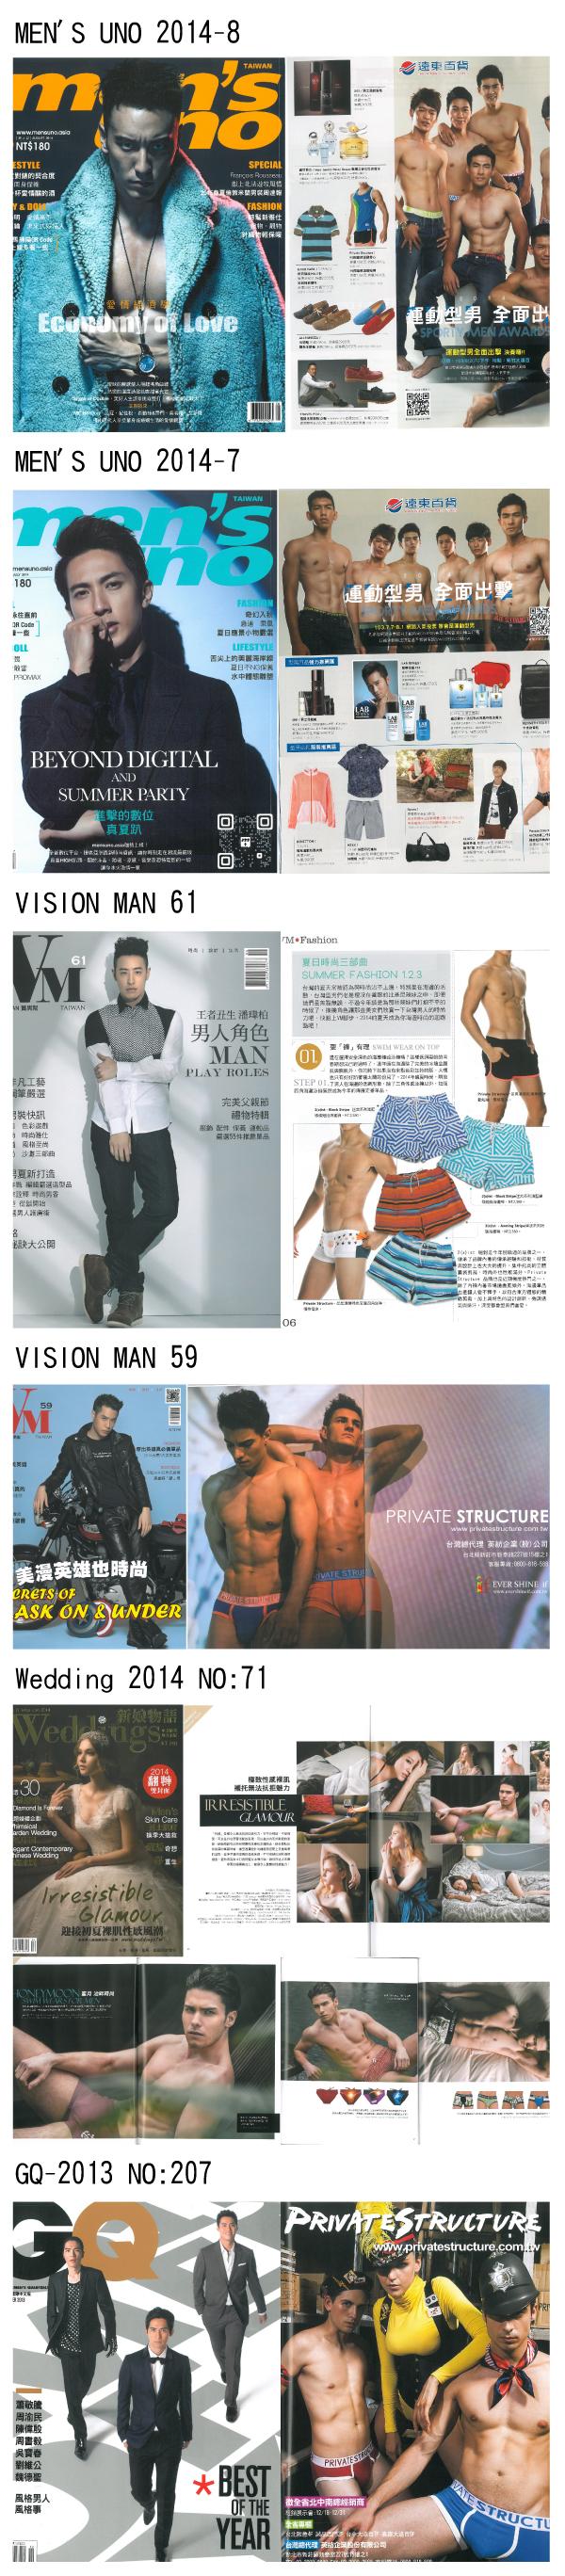 http://www.momoshop.com.tw/expertimg/0003/737/839/ps-magazine.jpg?t=1448902465